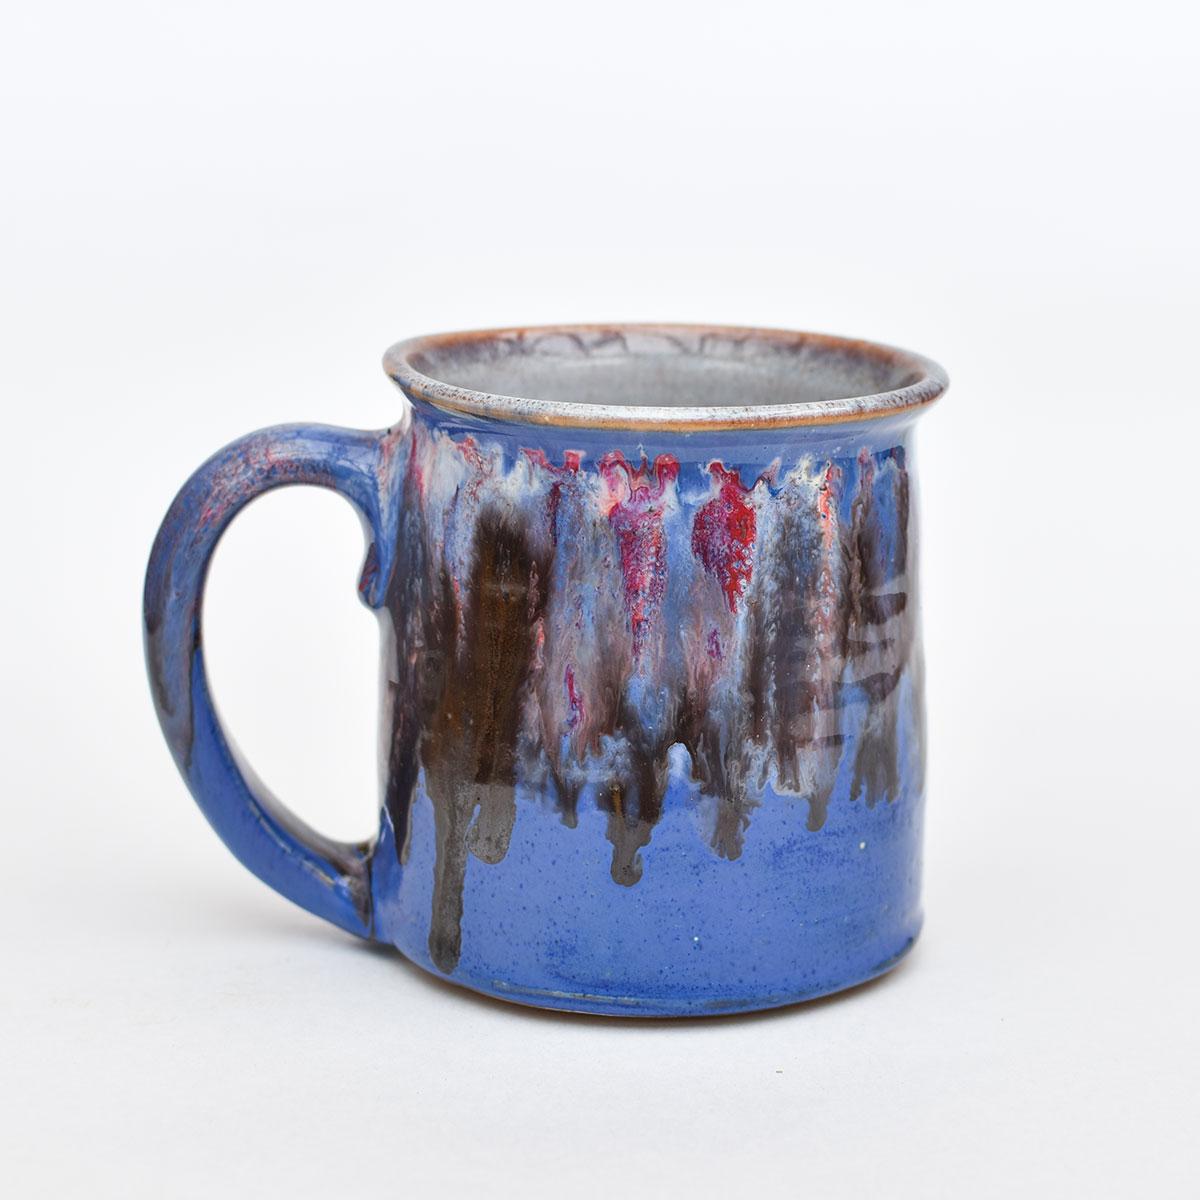 "картинка Керамическая чашка ""Хельсинки"" 05 - DishWishes.Ru"